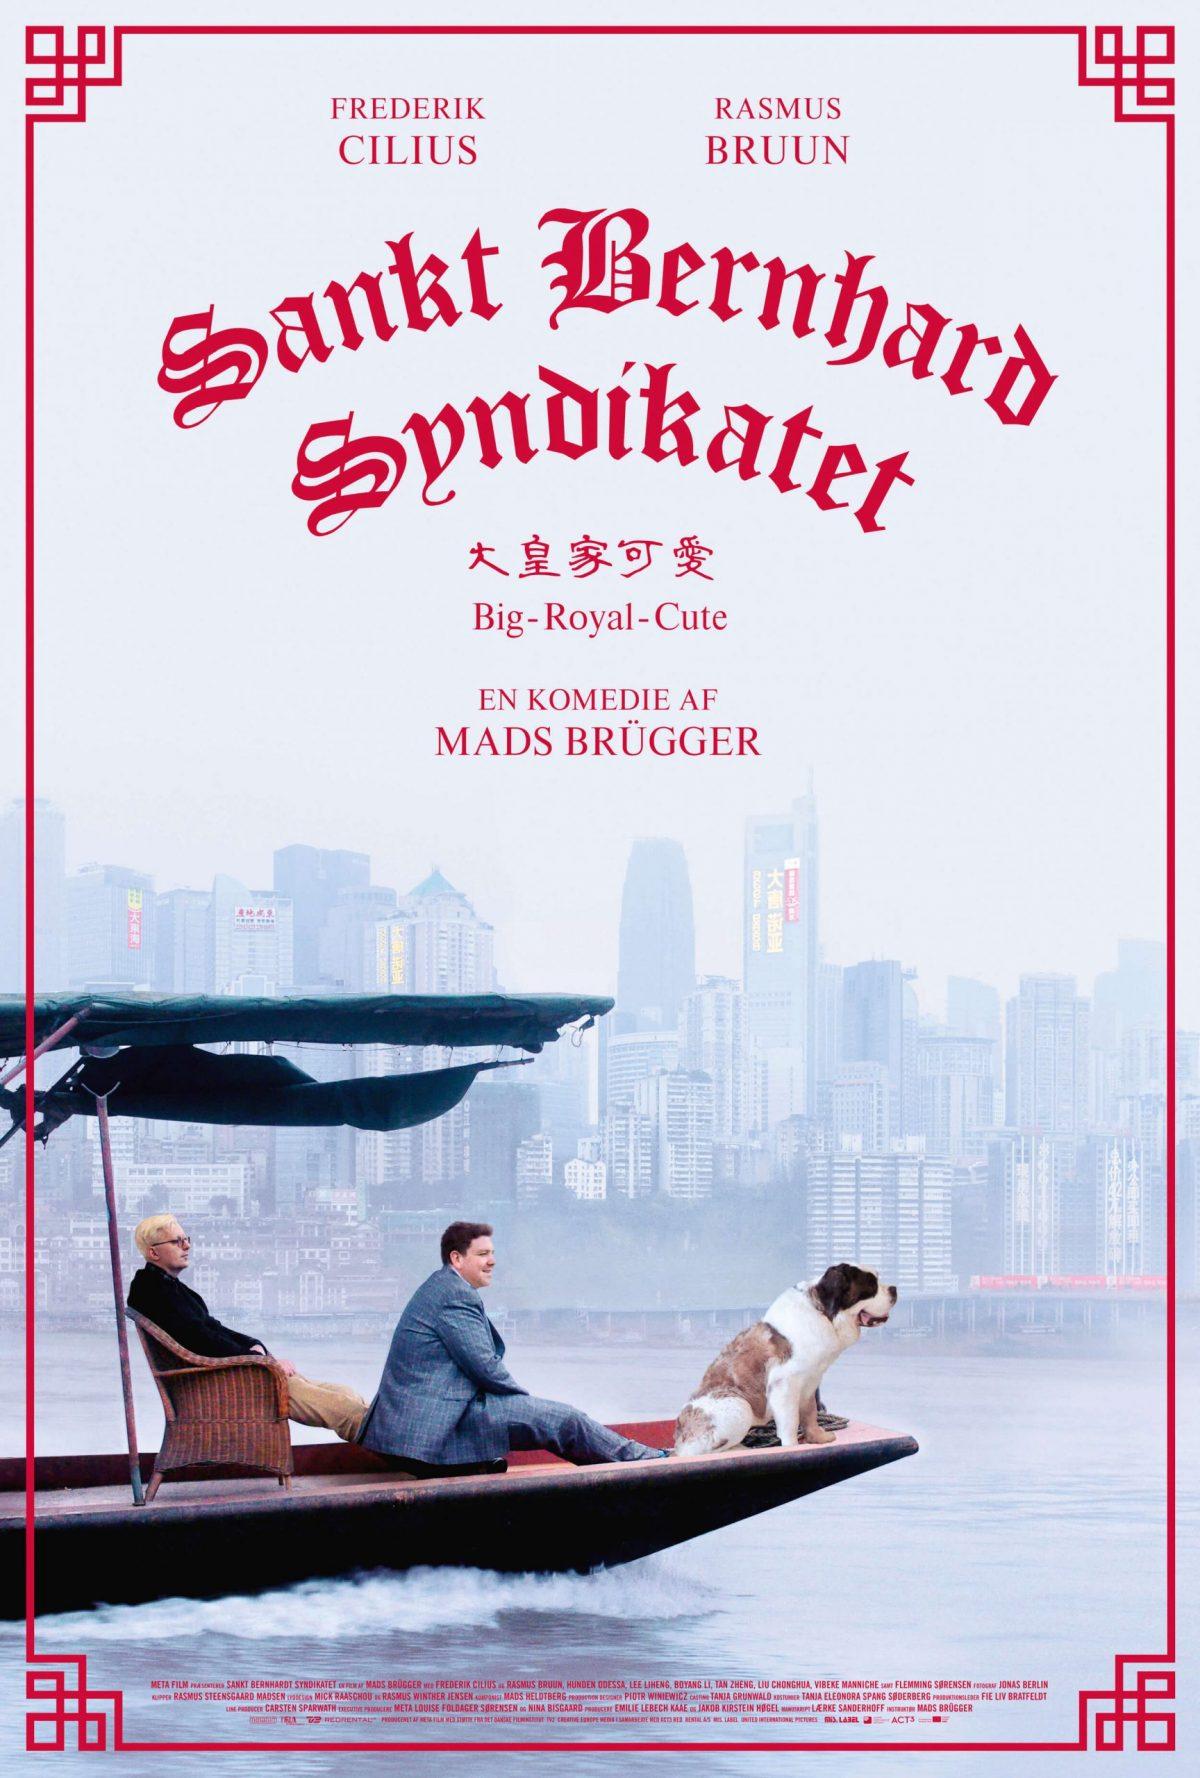 SanktBernhardSyndikatet_Poster_FINAL_RGB_DK_LOWRES